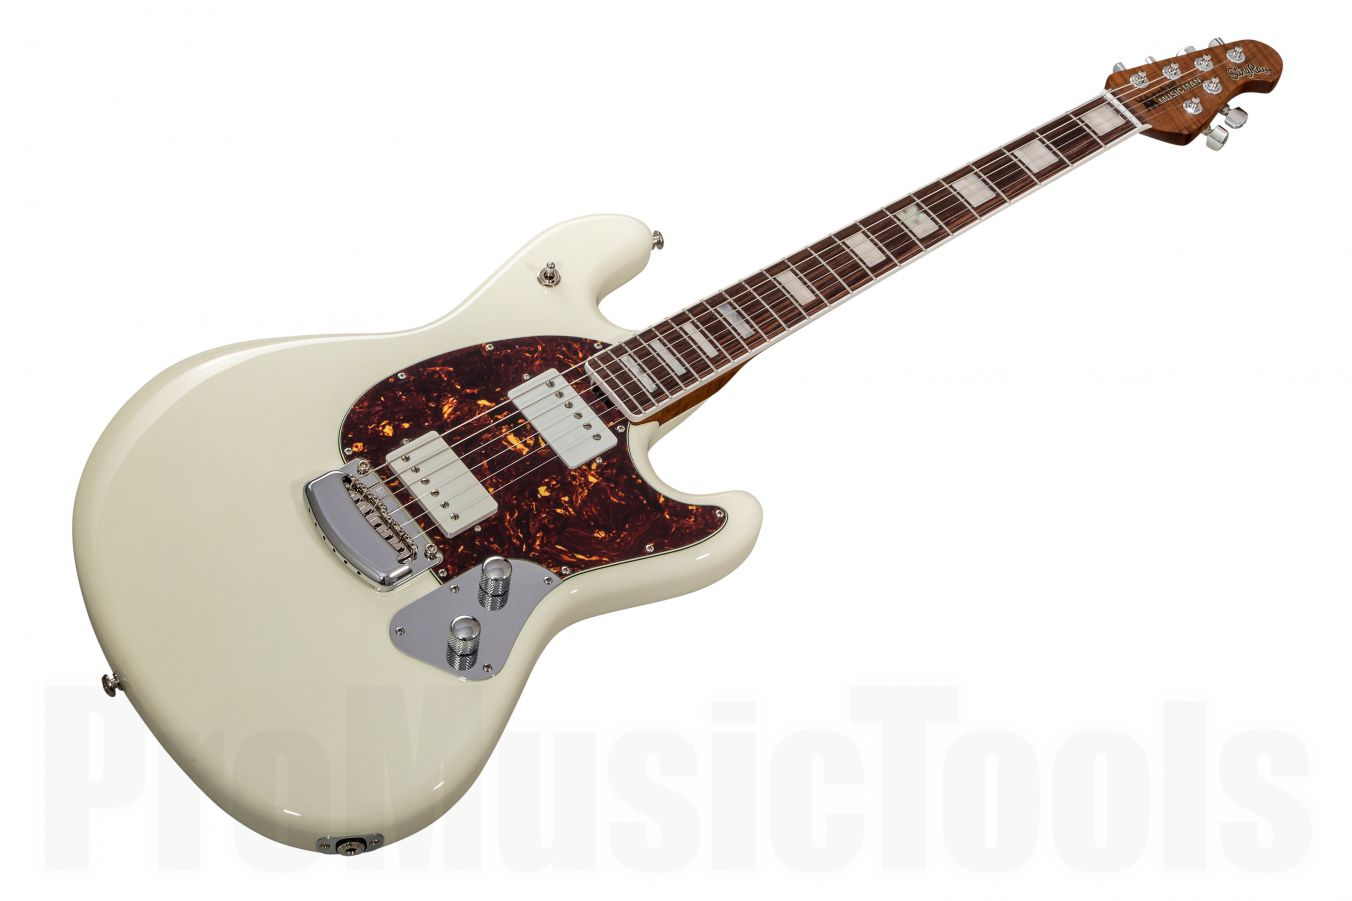 Music Man USA Stingray Guitar BFR White Smoke - Limited Edition